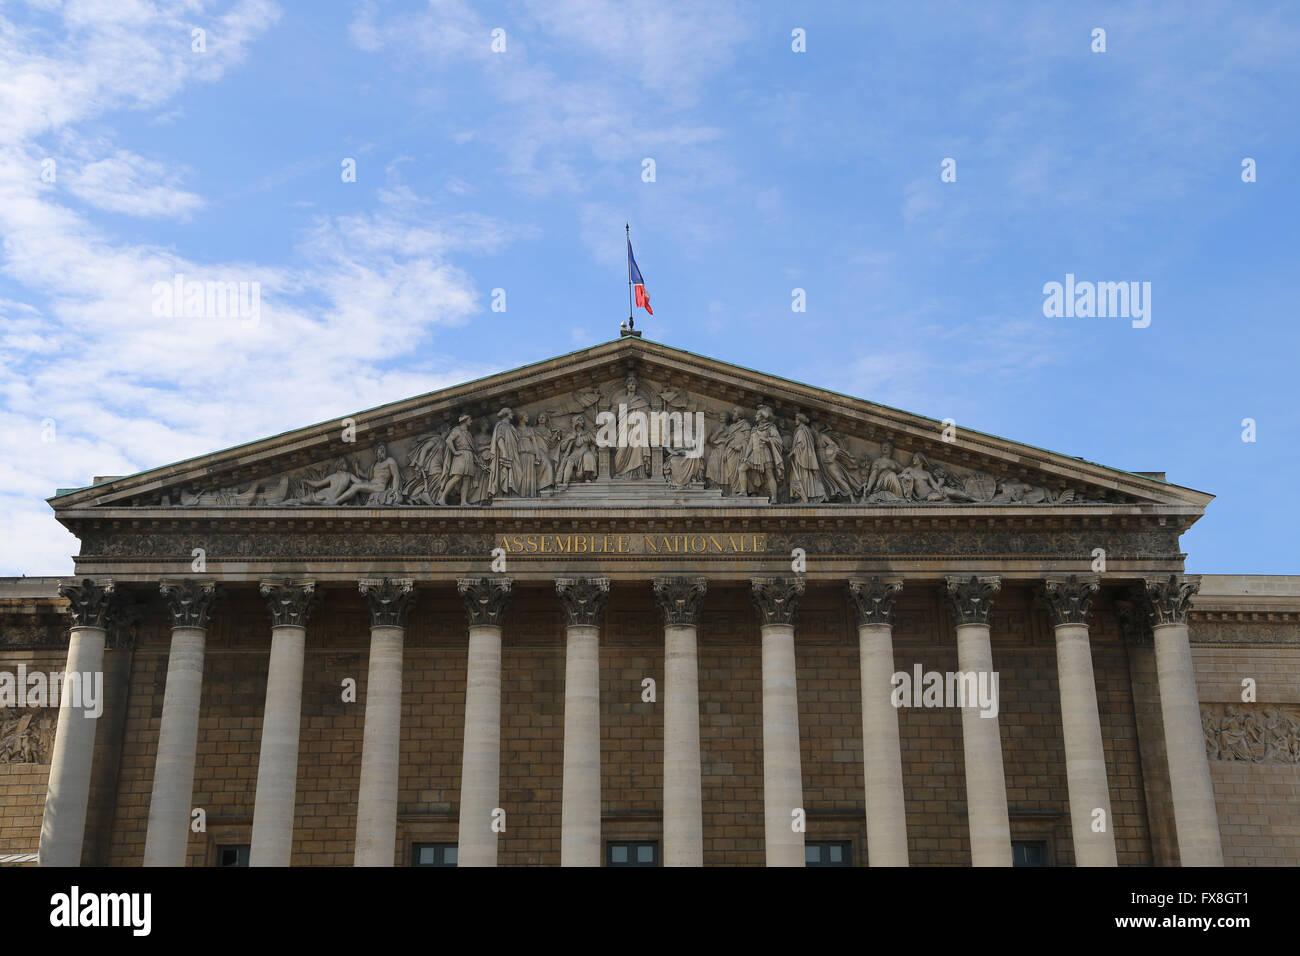 France. Paris. Facade of National Assembly (Bourbon palace), 1806-08 by Bernard Poyet. - Stock Image